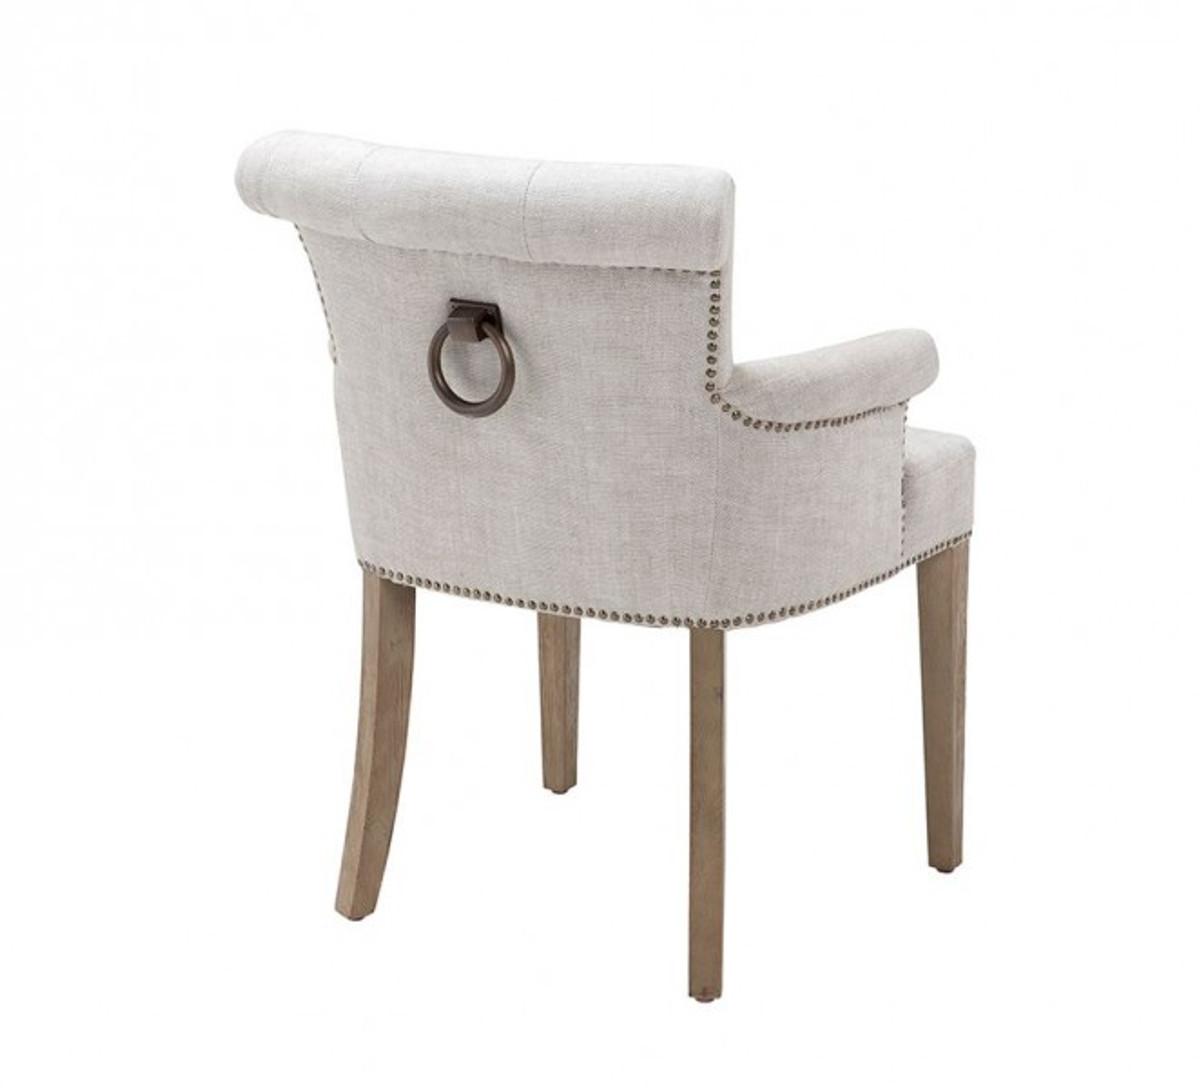 casa padrino luxus stuhl mit armlehne wei luxus kollektion st hle luxus st hle luxus. Black Bedroom Furniture Sets. Home Design Ideas